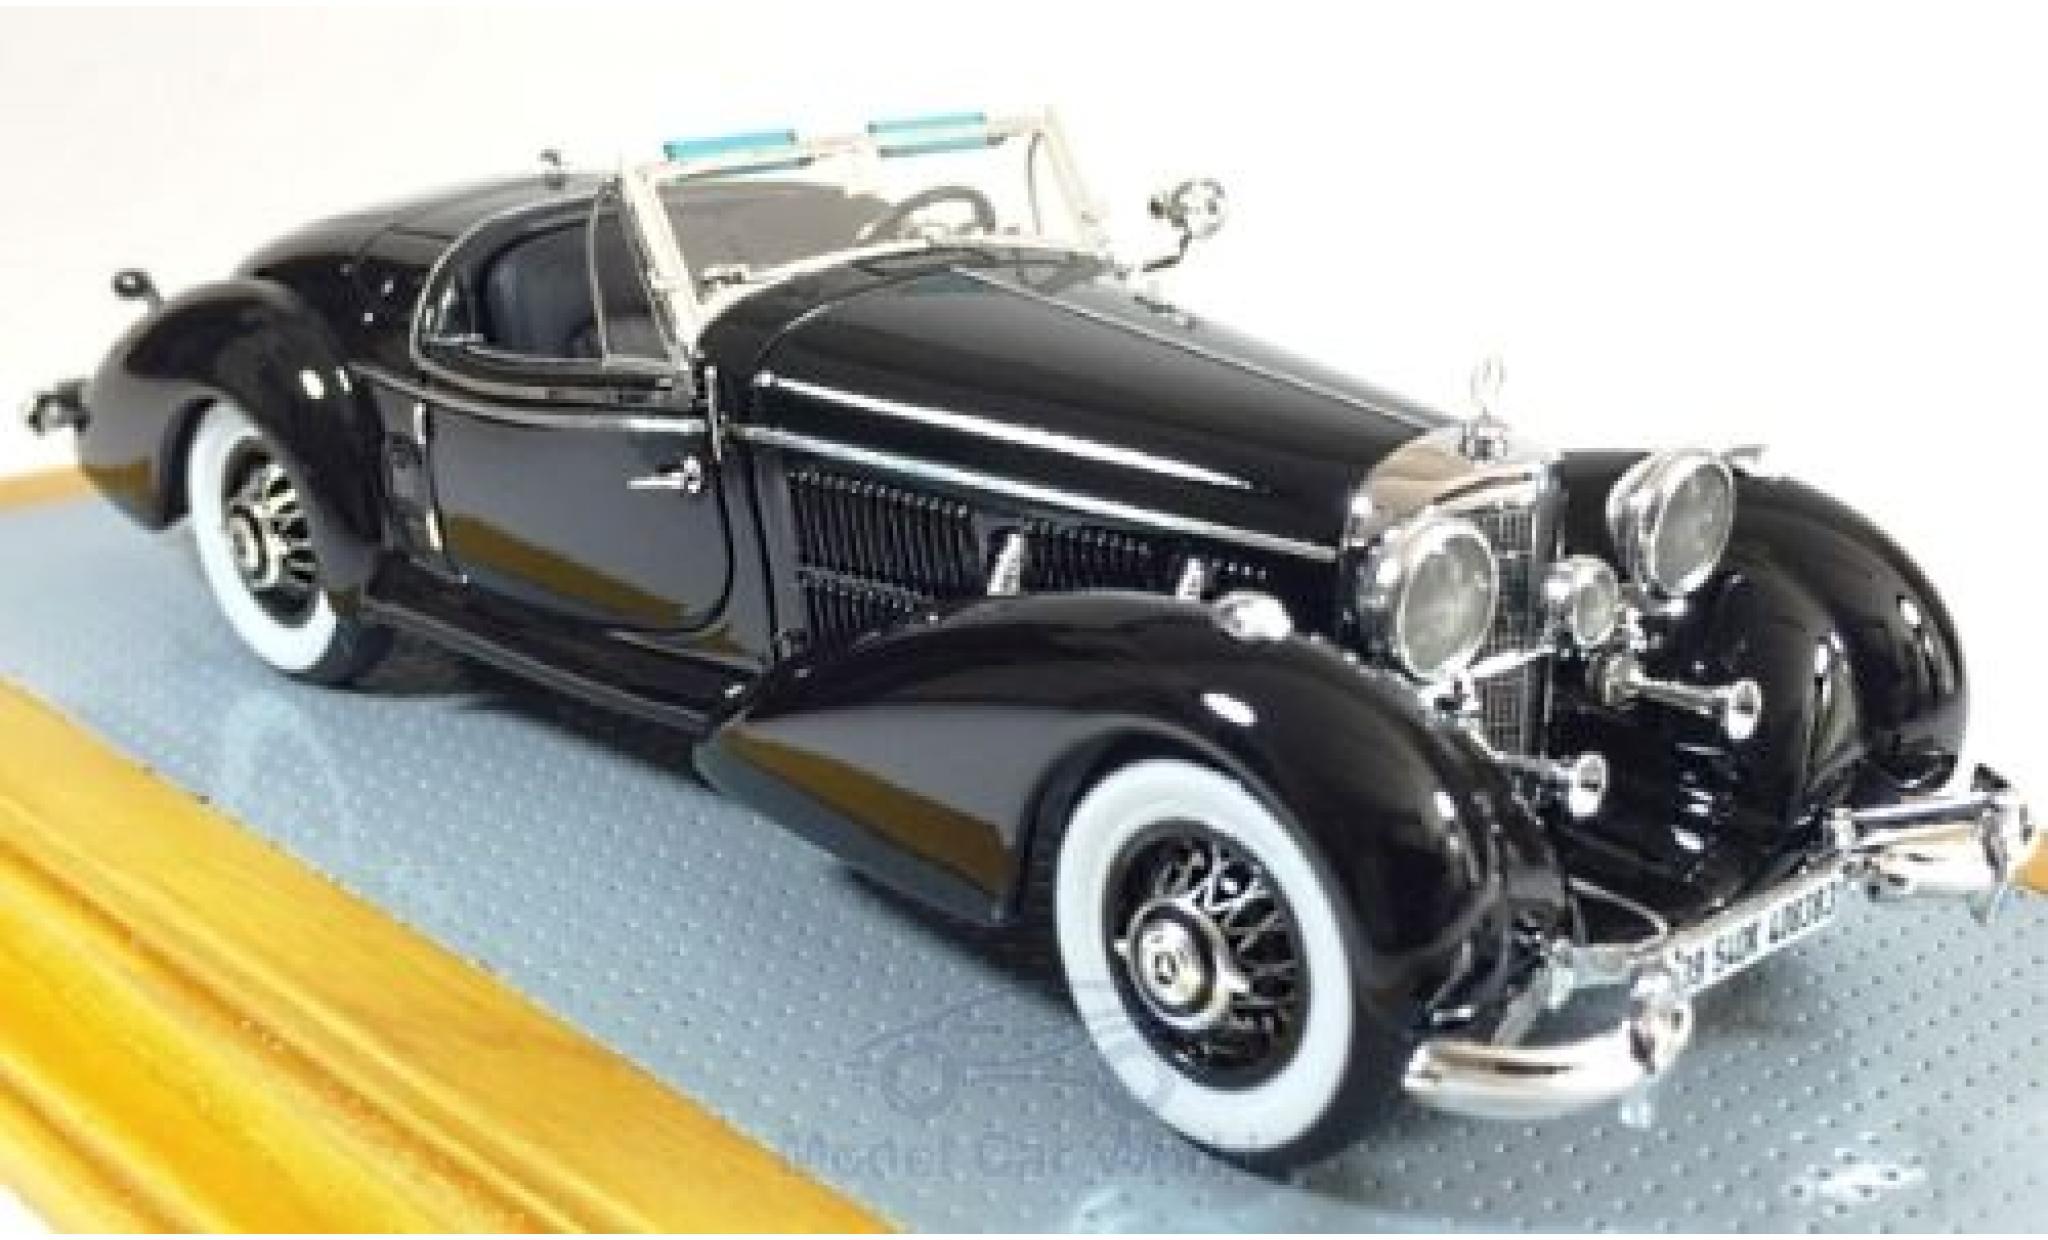 Mercedes 540 1/43 Ilario K Spezial Roadster noire 1939 sn408383